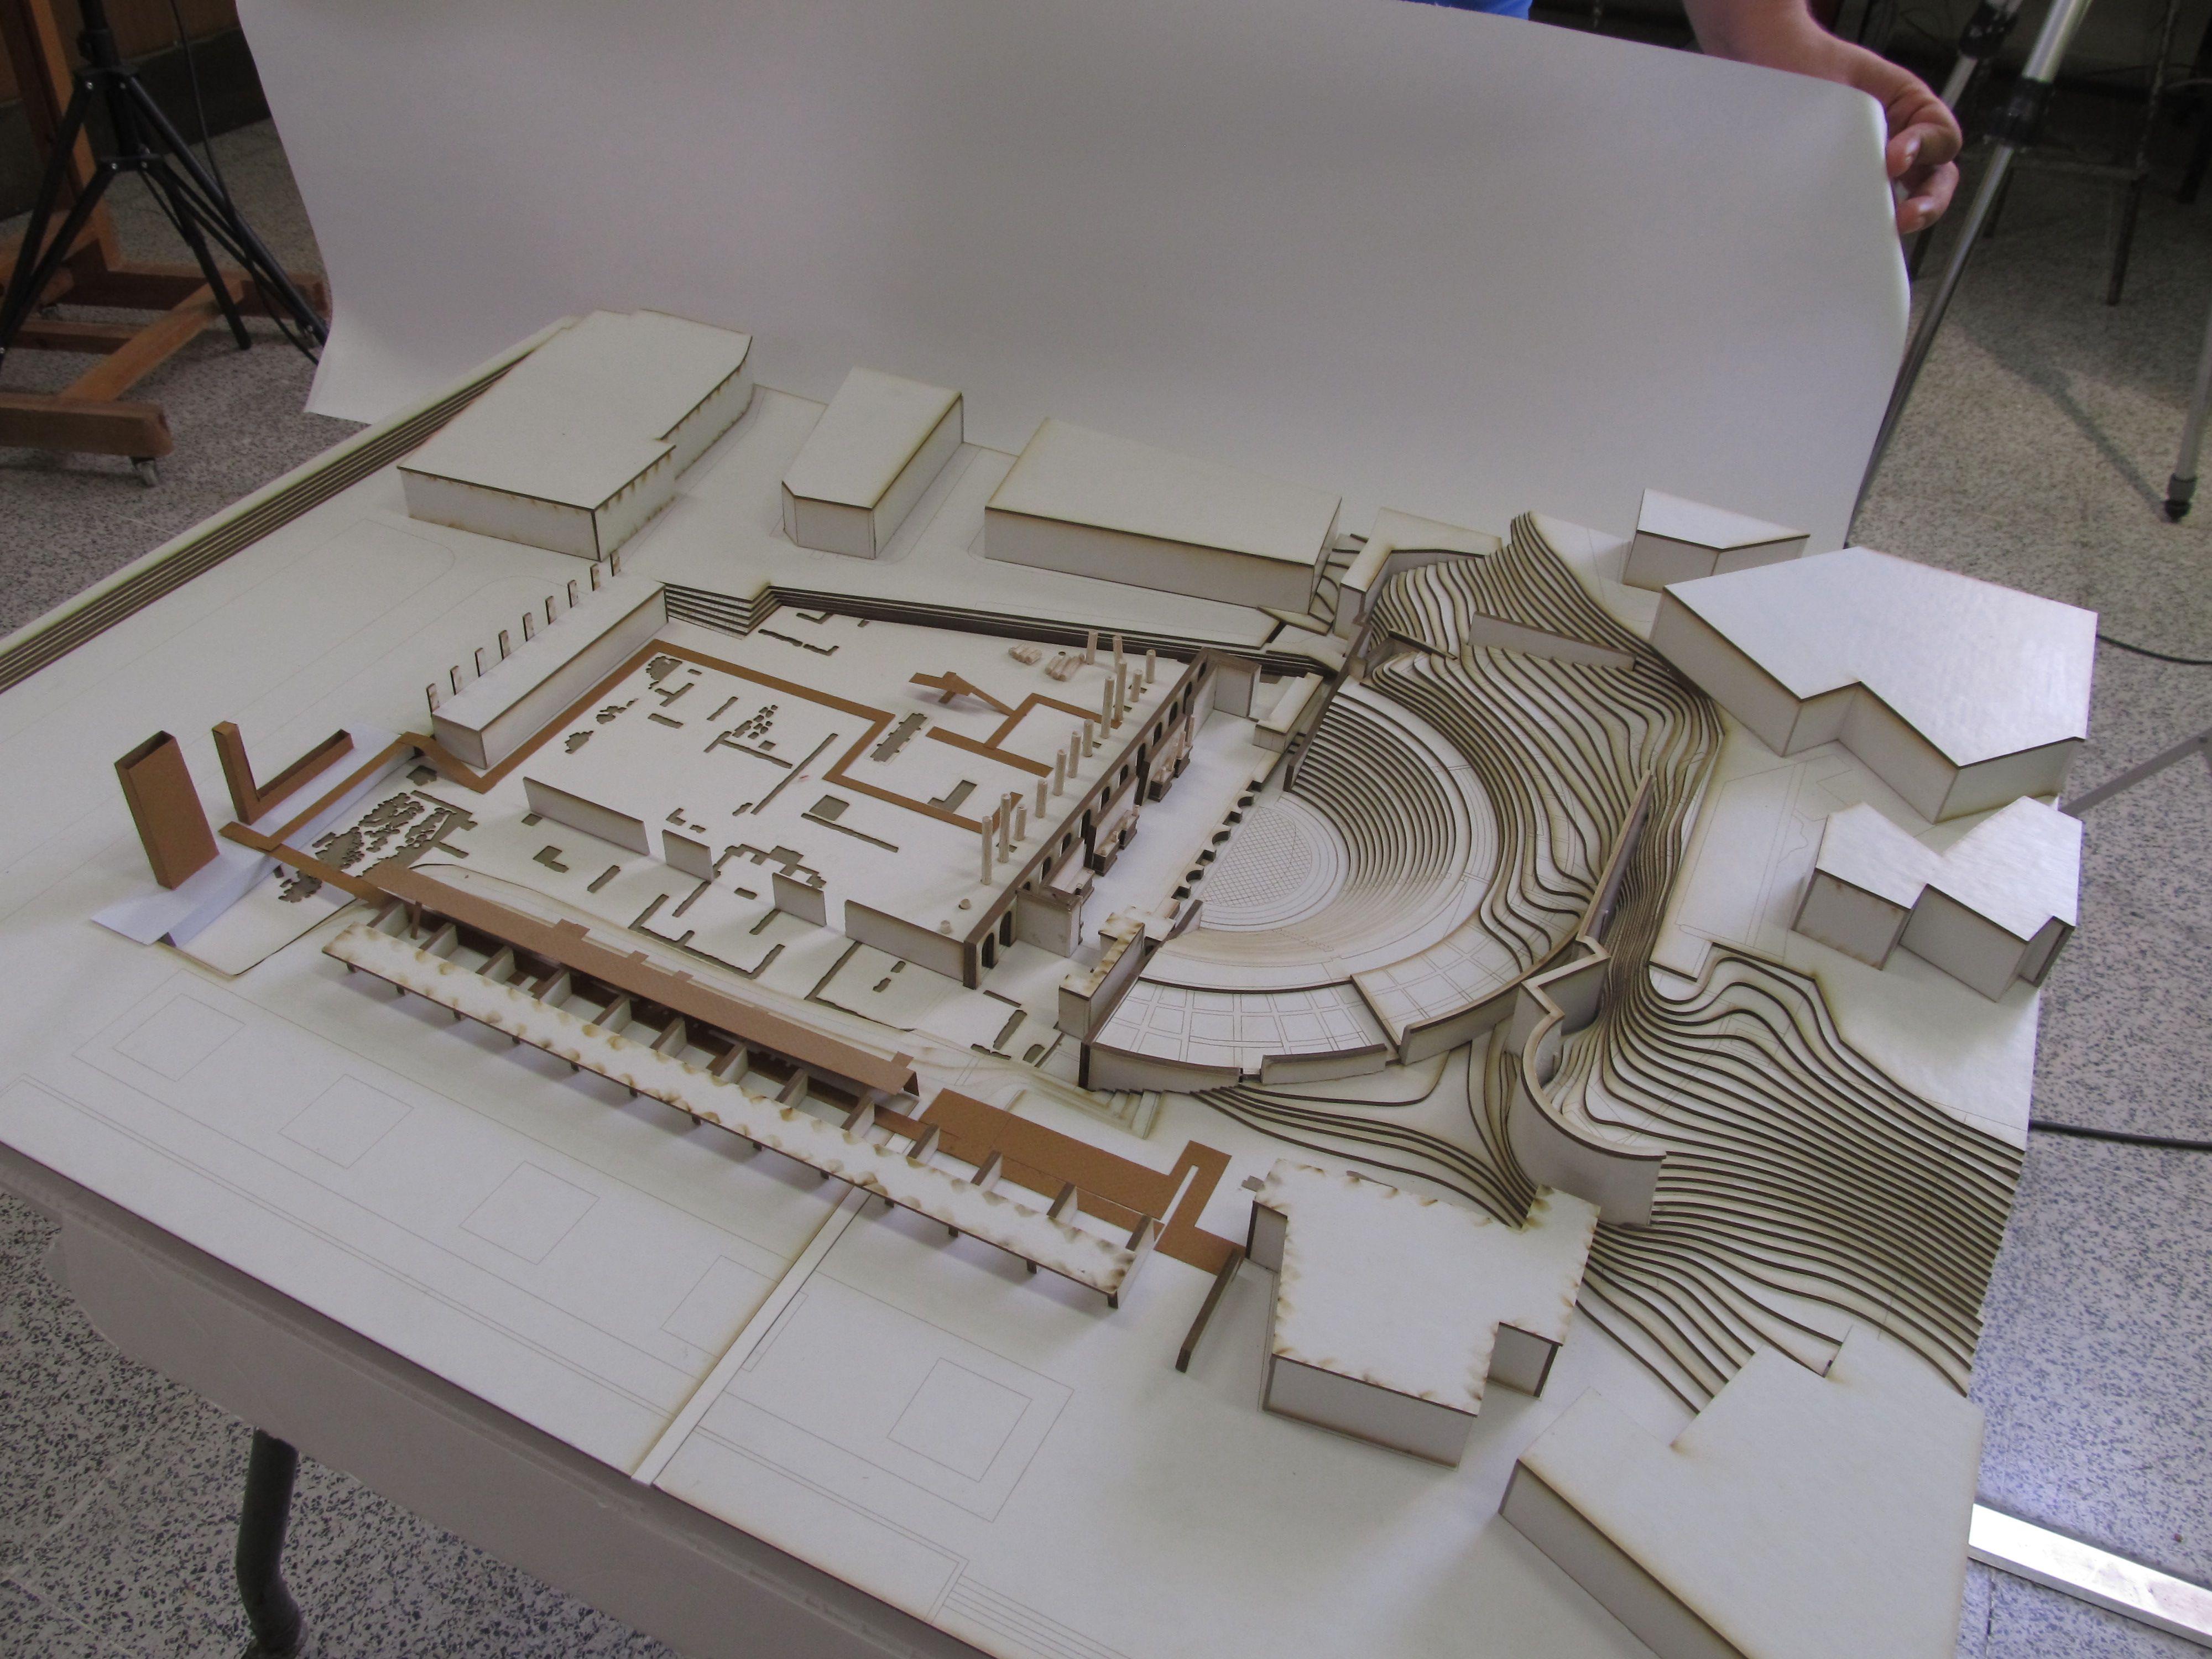 Escuela t cnica superior de arquitectura de sevilla maqueta fin de carrera maquetas de - Escuela tecnica superior de arquitectura sevilla ...